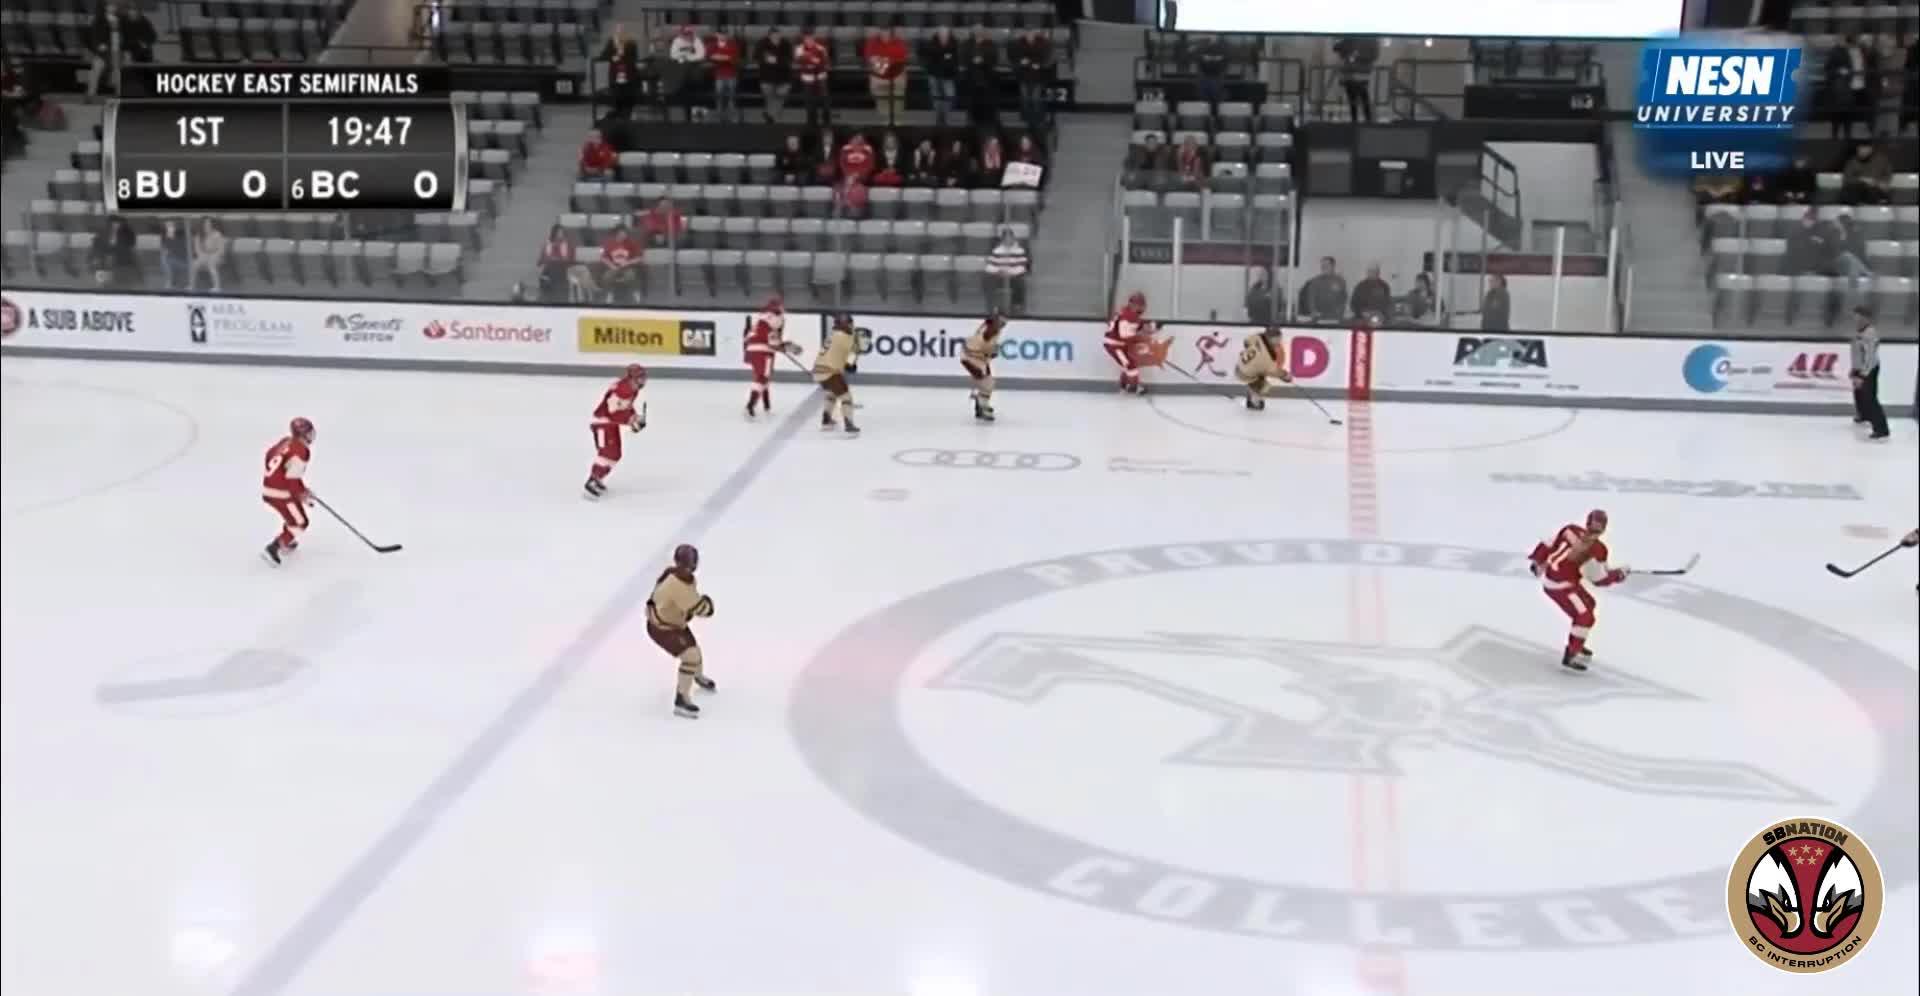 hockey, 1 Agnew (W) BU 3/9/19 GIFs